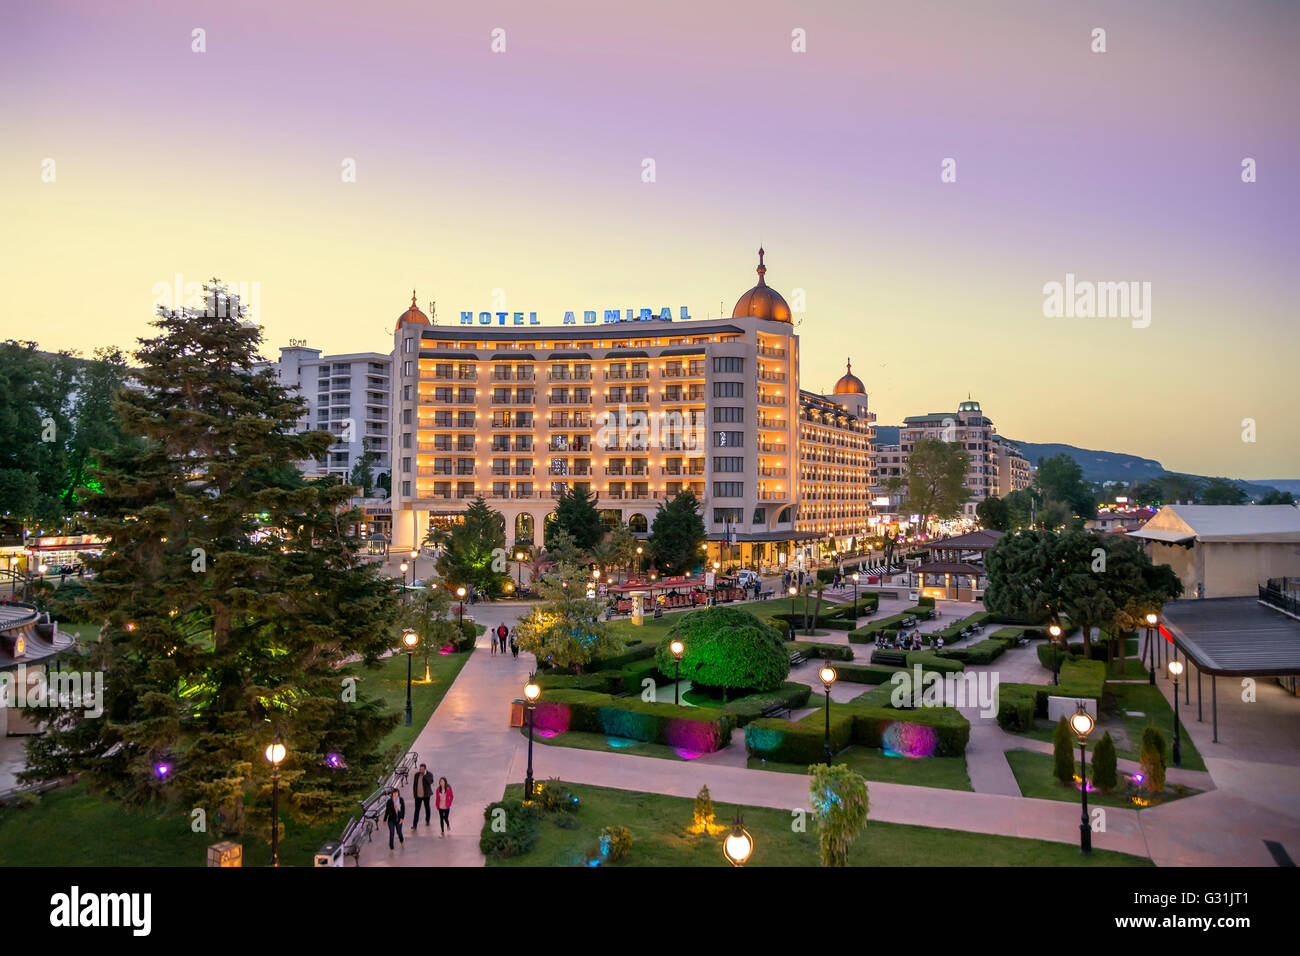 Bulgarien Goldstrand Hotel Sirius Beach